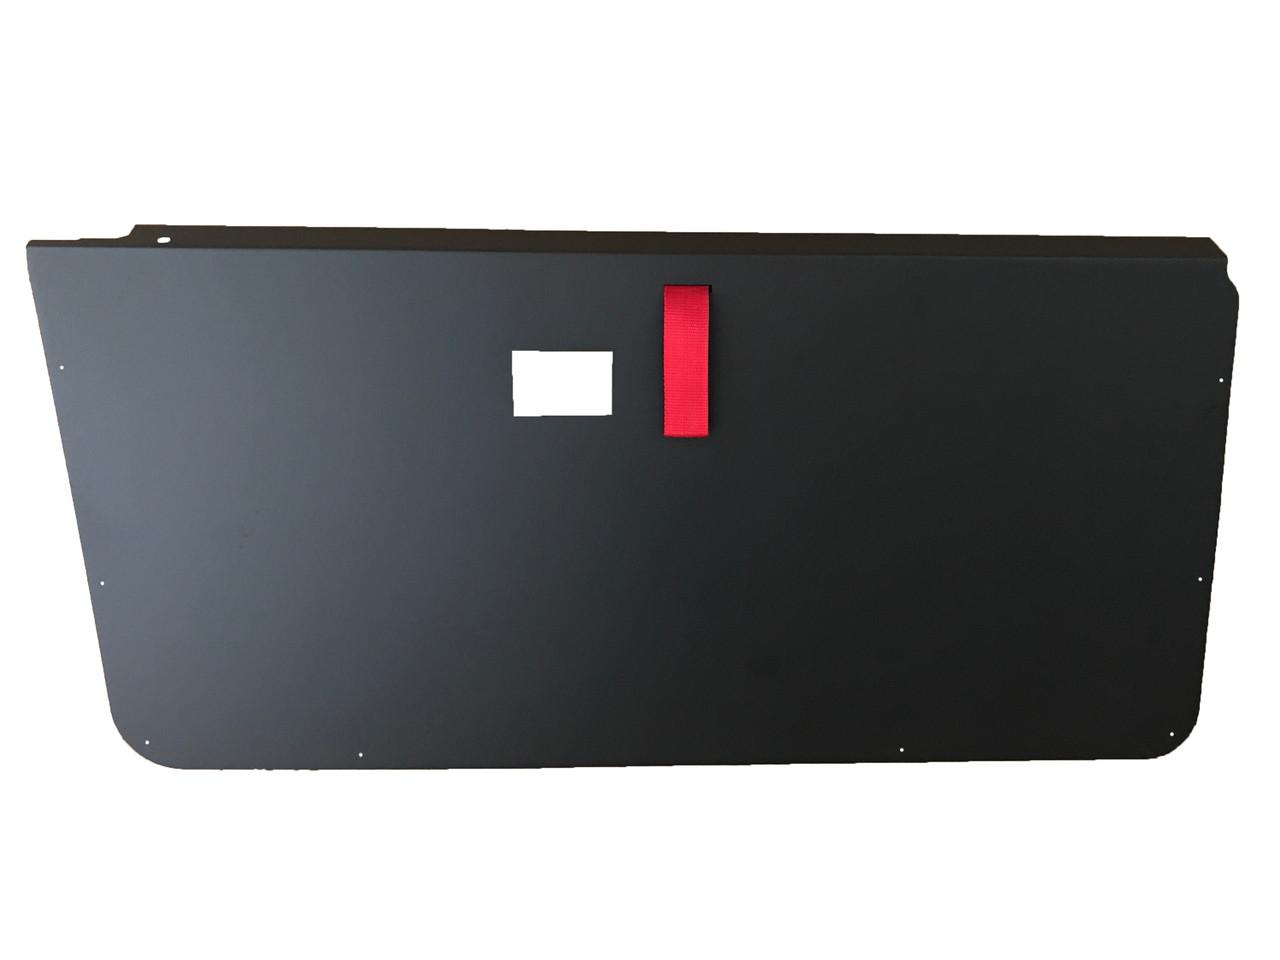 E30 V3 Coupe Door Panels Set Of 2 Mkah Motorsports Llc